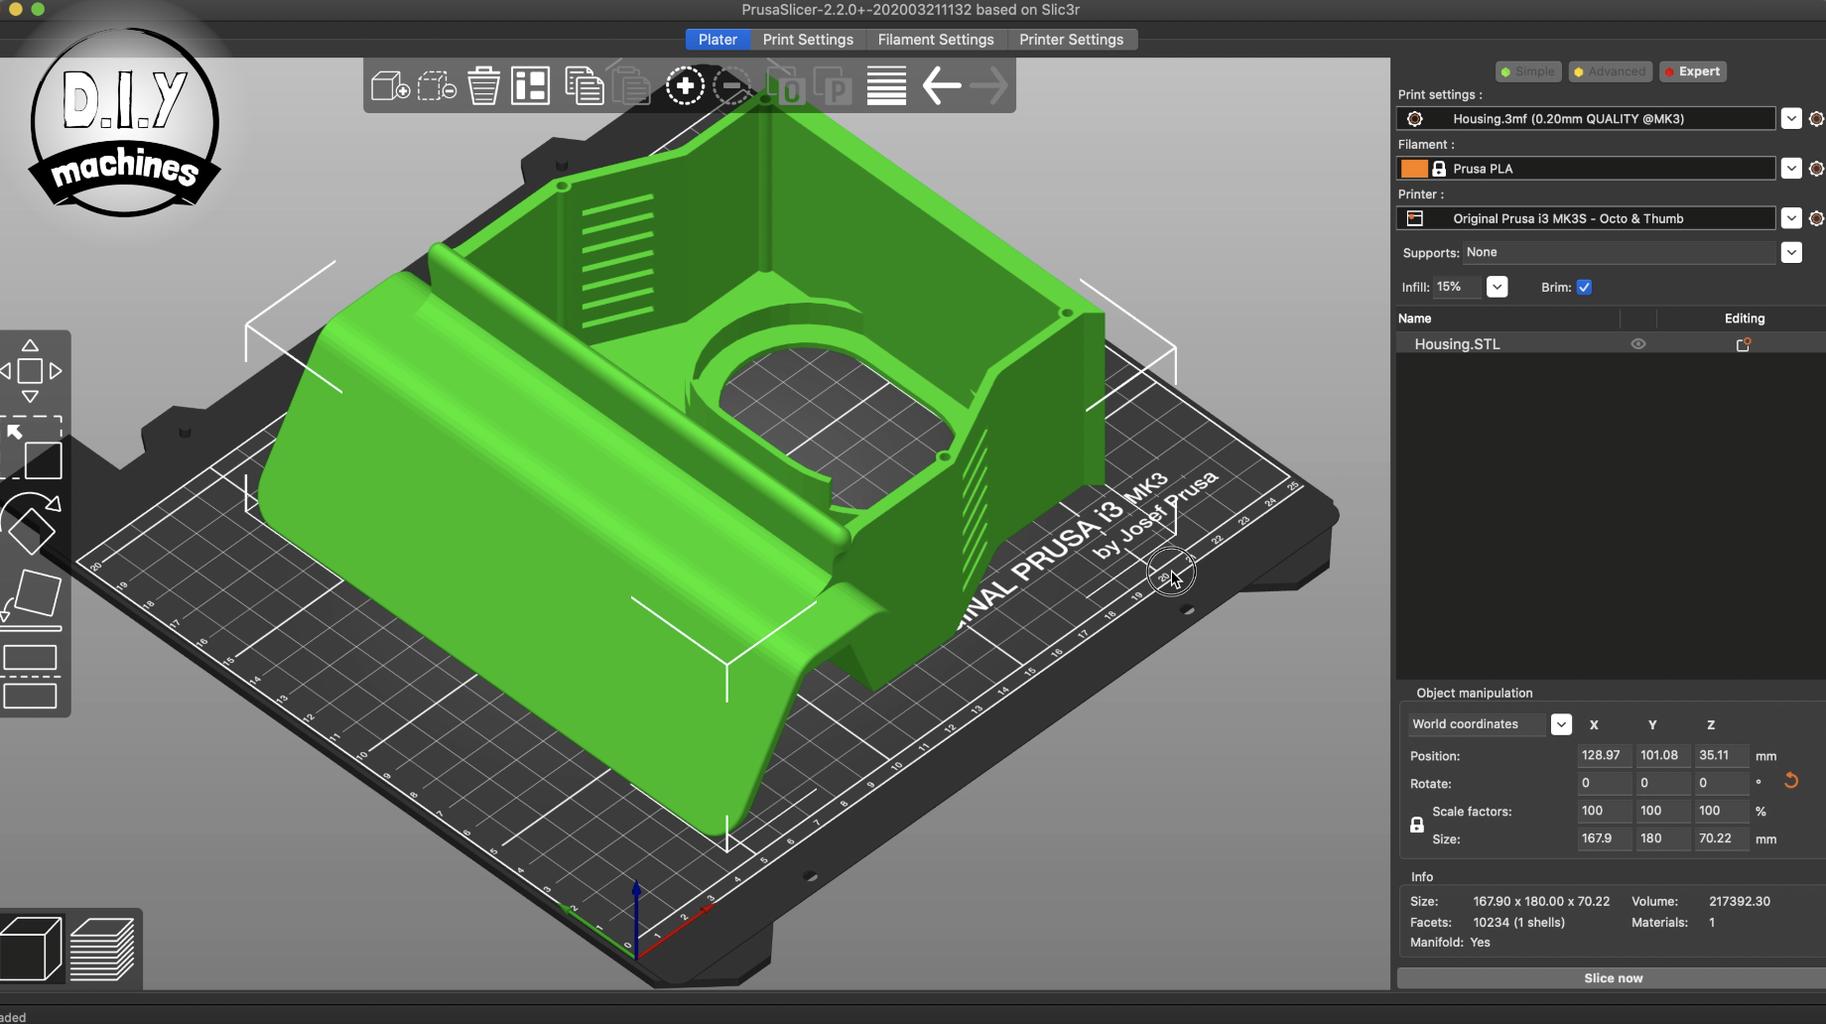 Printing the Control Panel